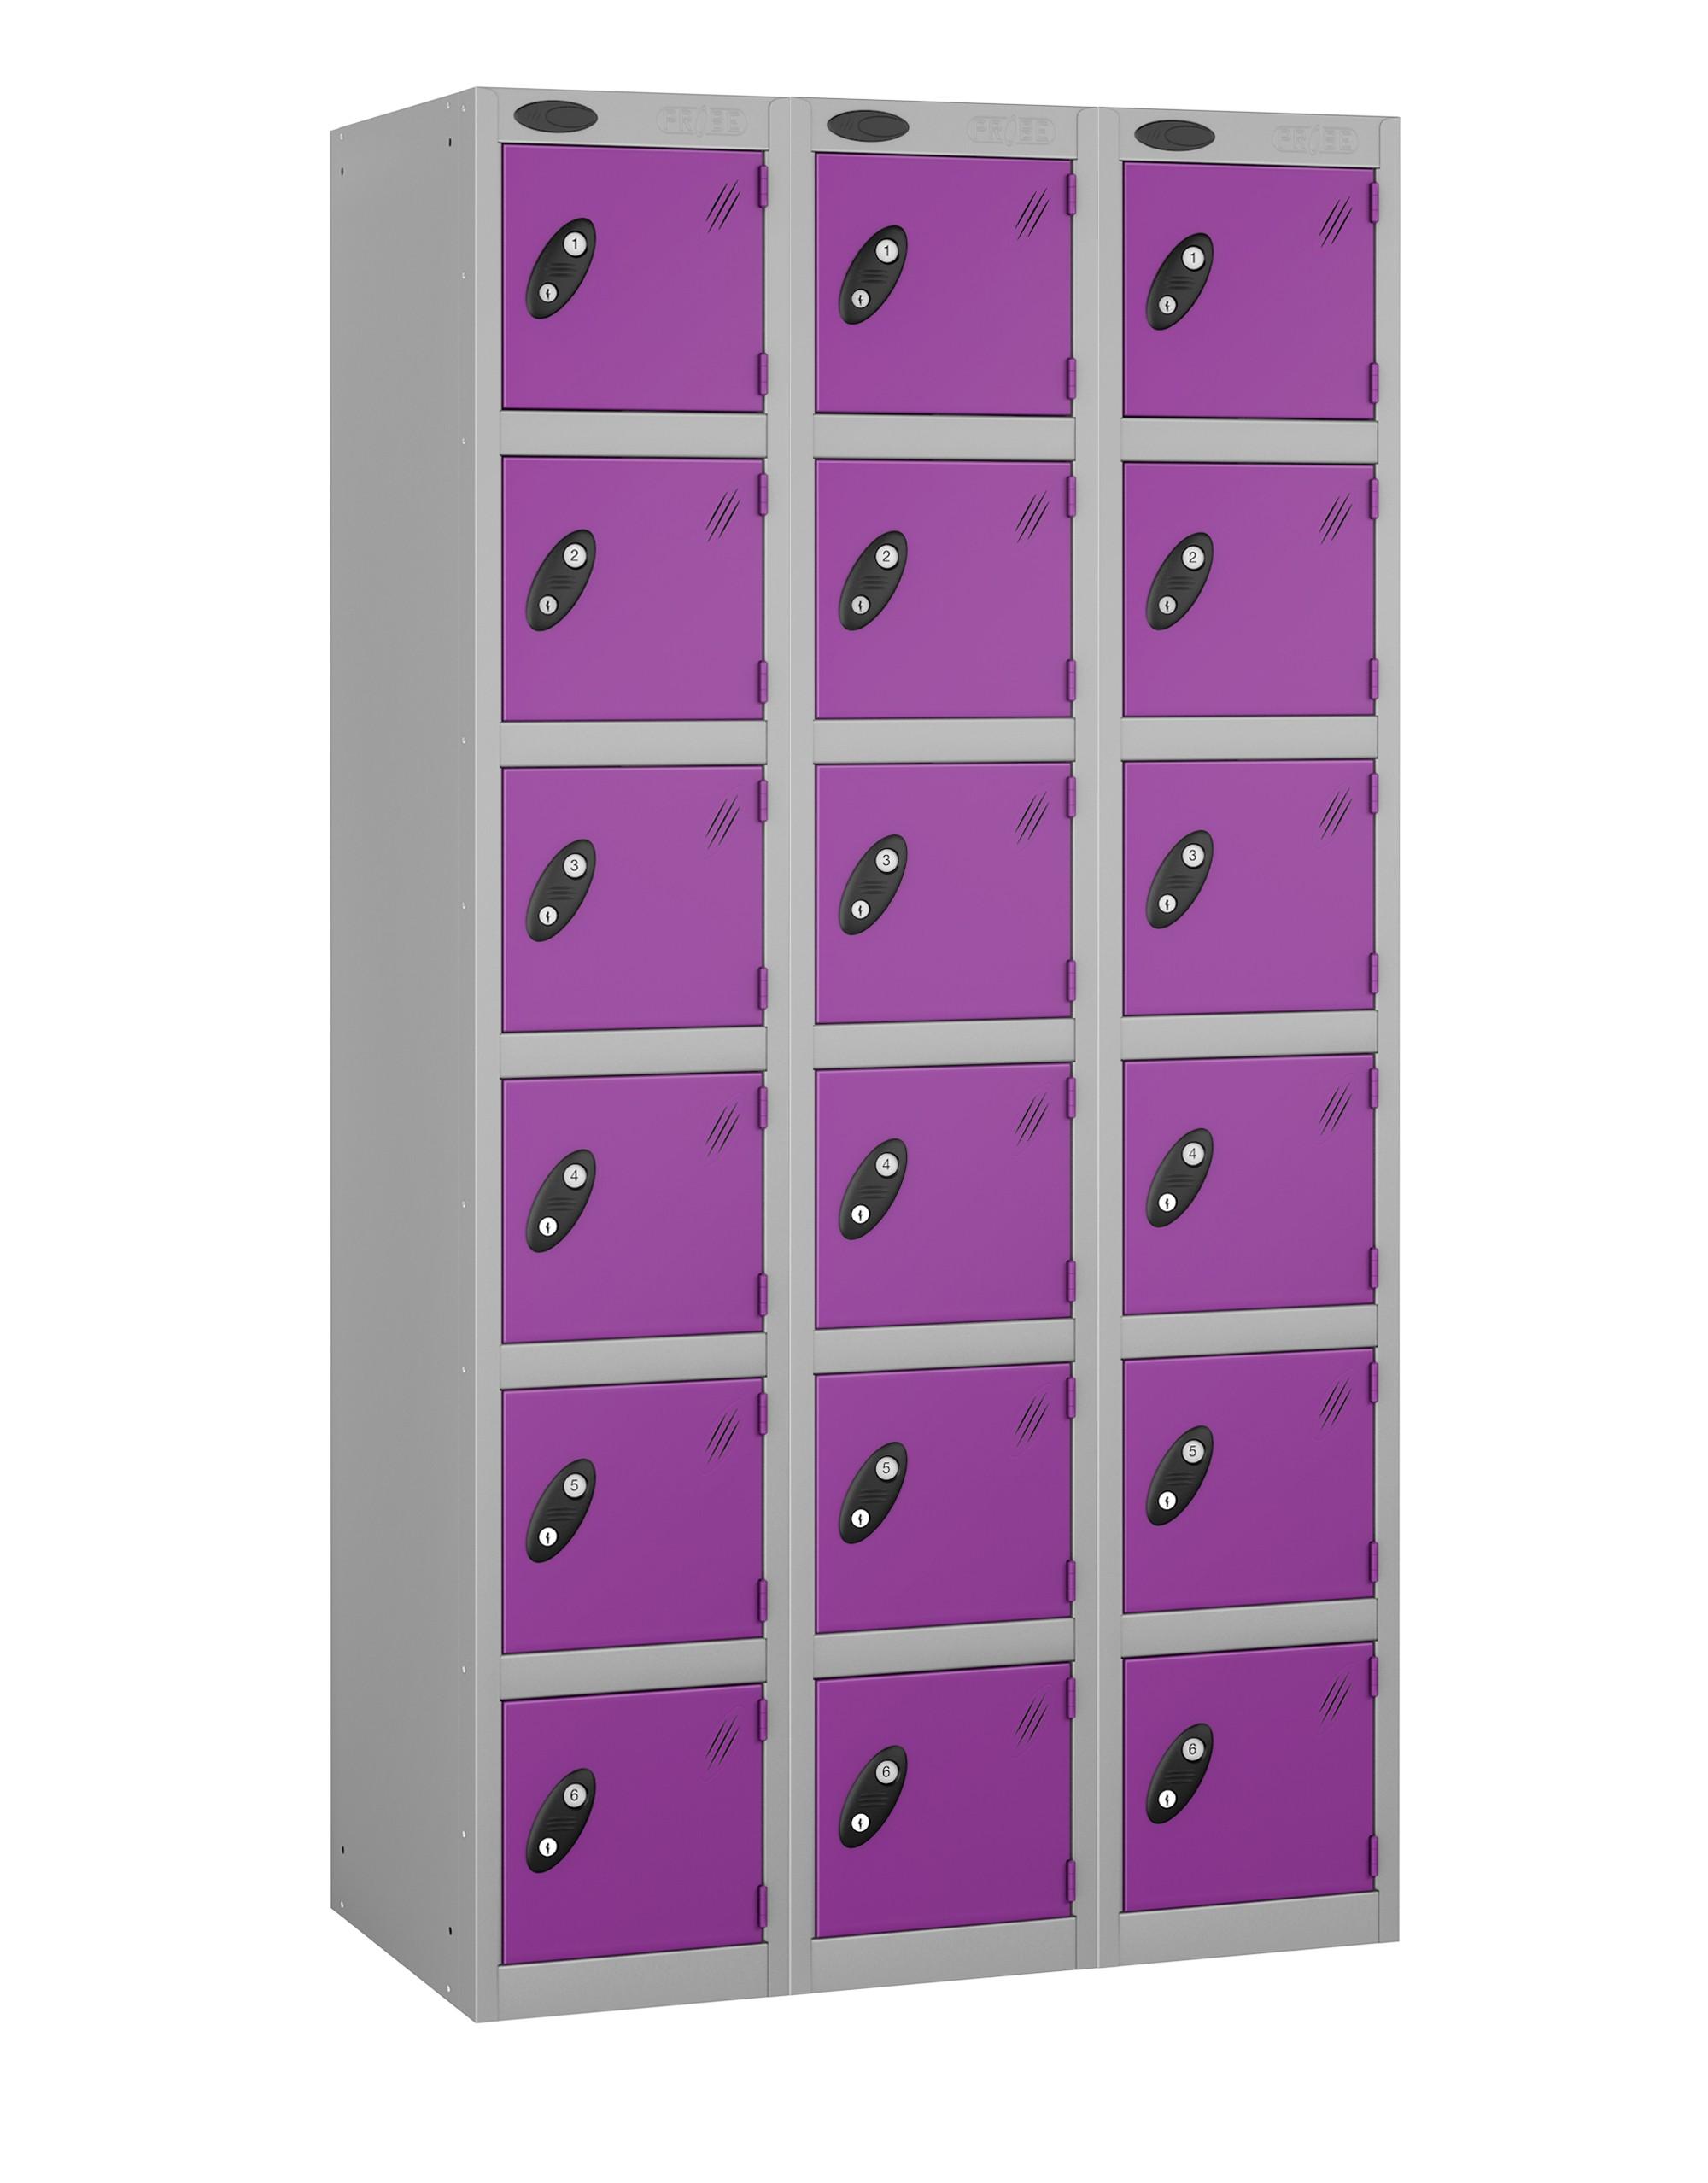 Colour Range Six Doors Locker - Nest of 3